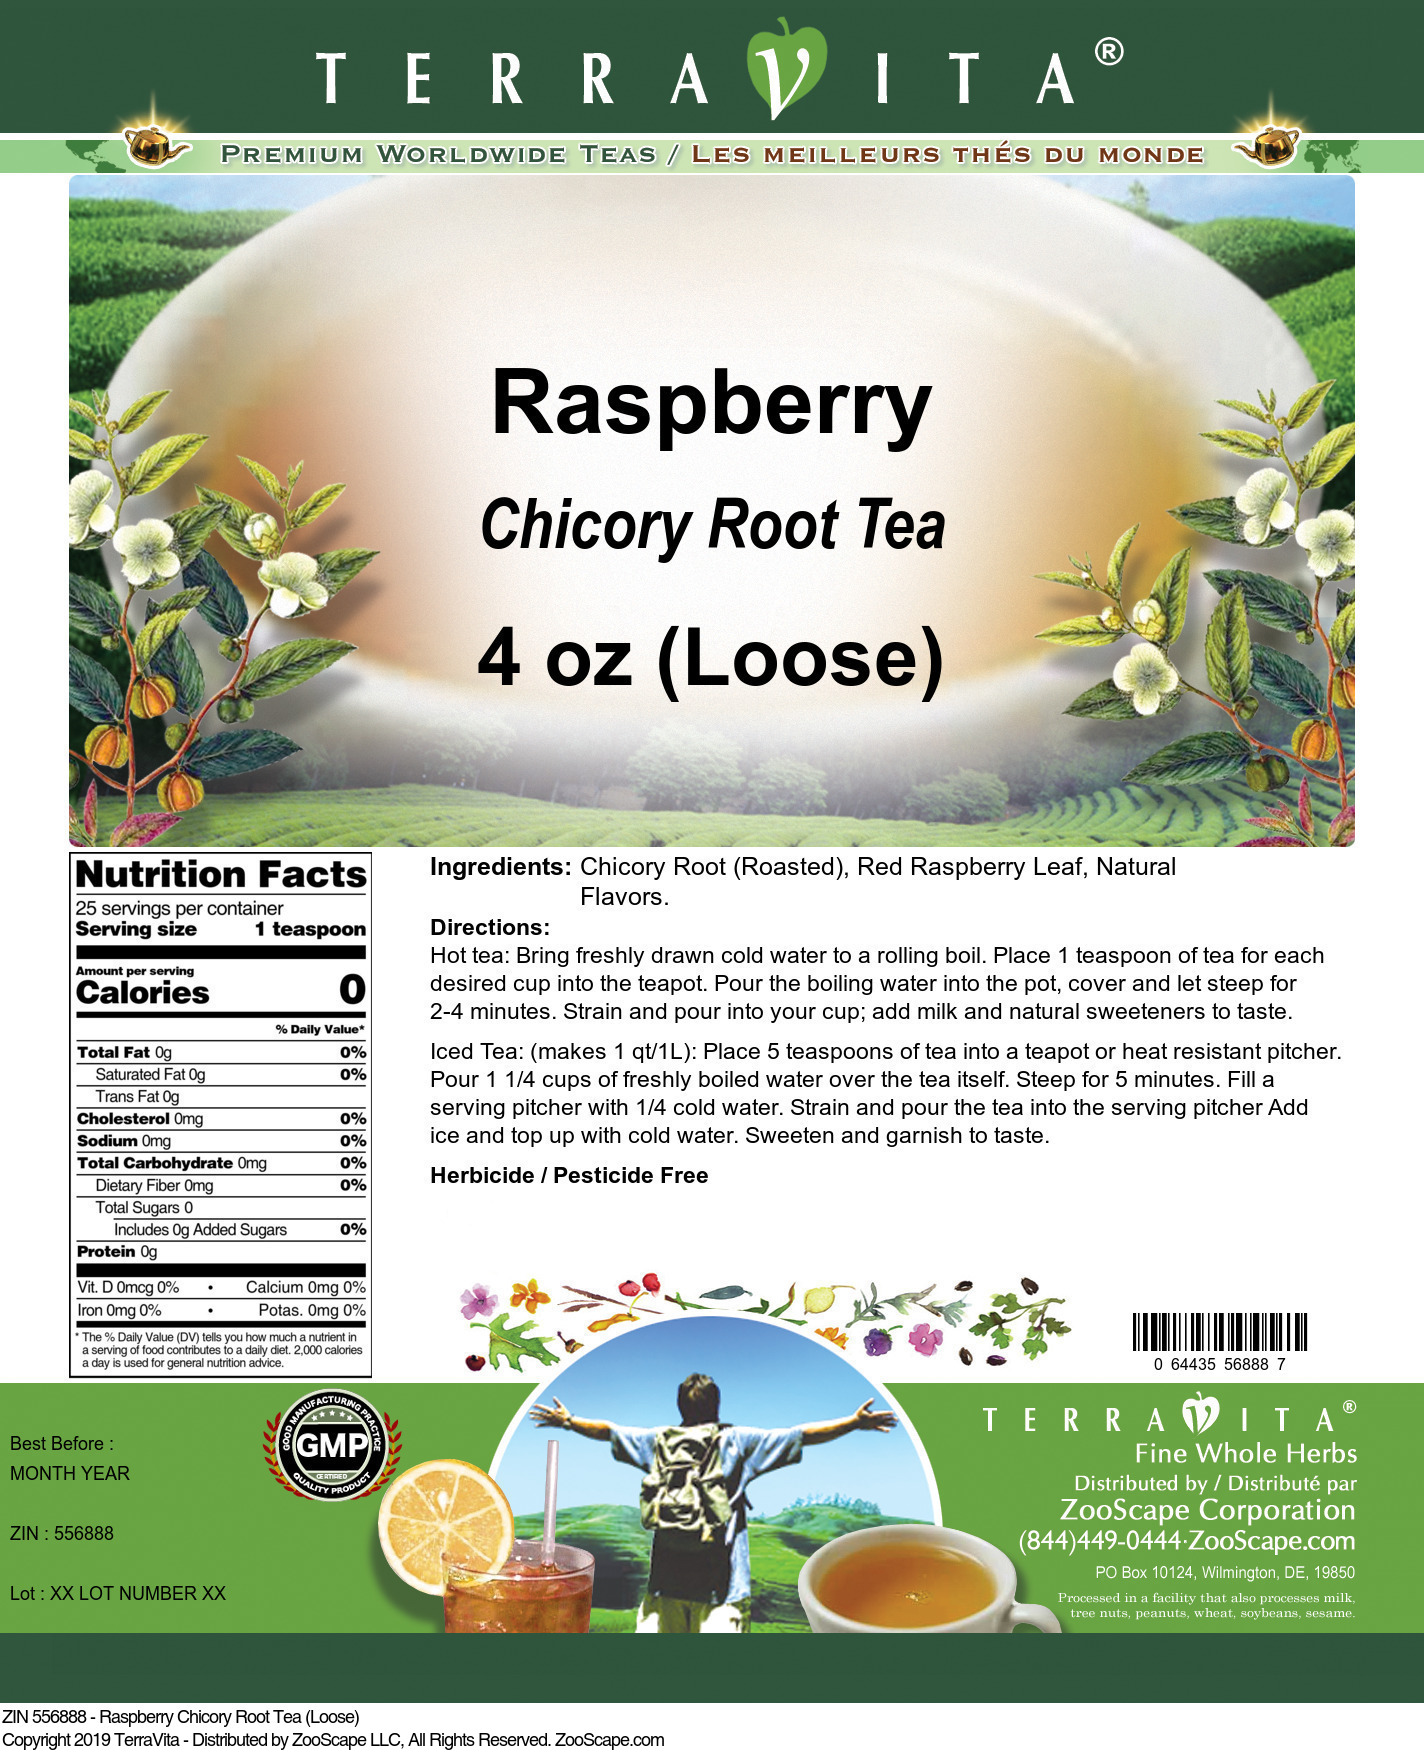 Raspberry Chicory Root Tea (Loose)